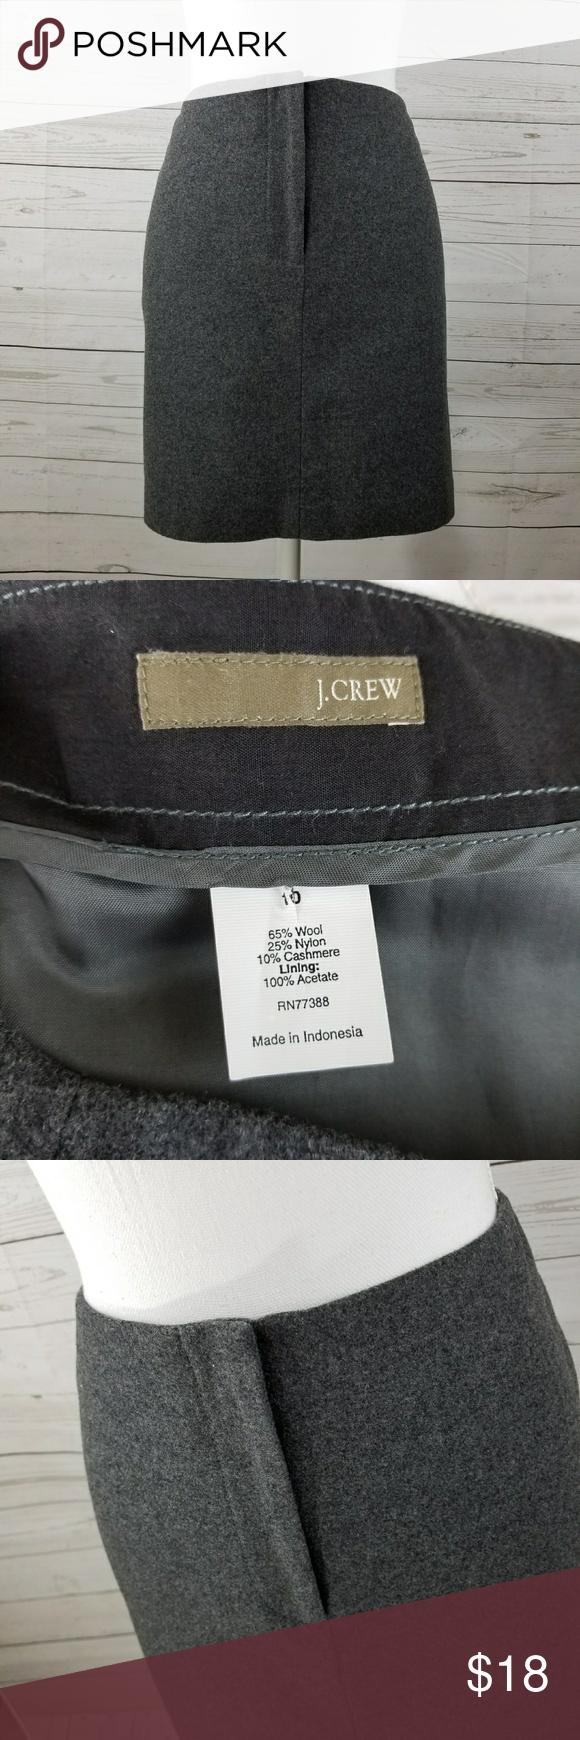 J. CREW gray Wool Pencil Skirt Size 10 J. CREW gray Wool Skirt Size 10 Waist 16